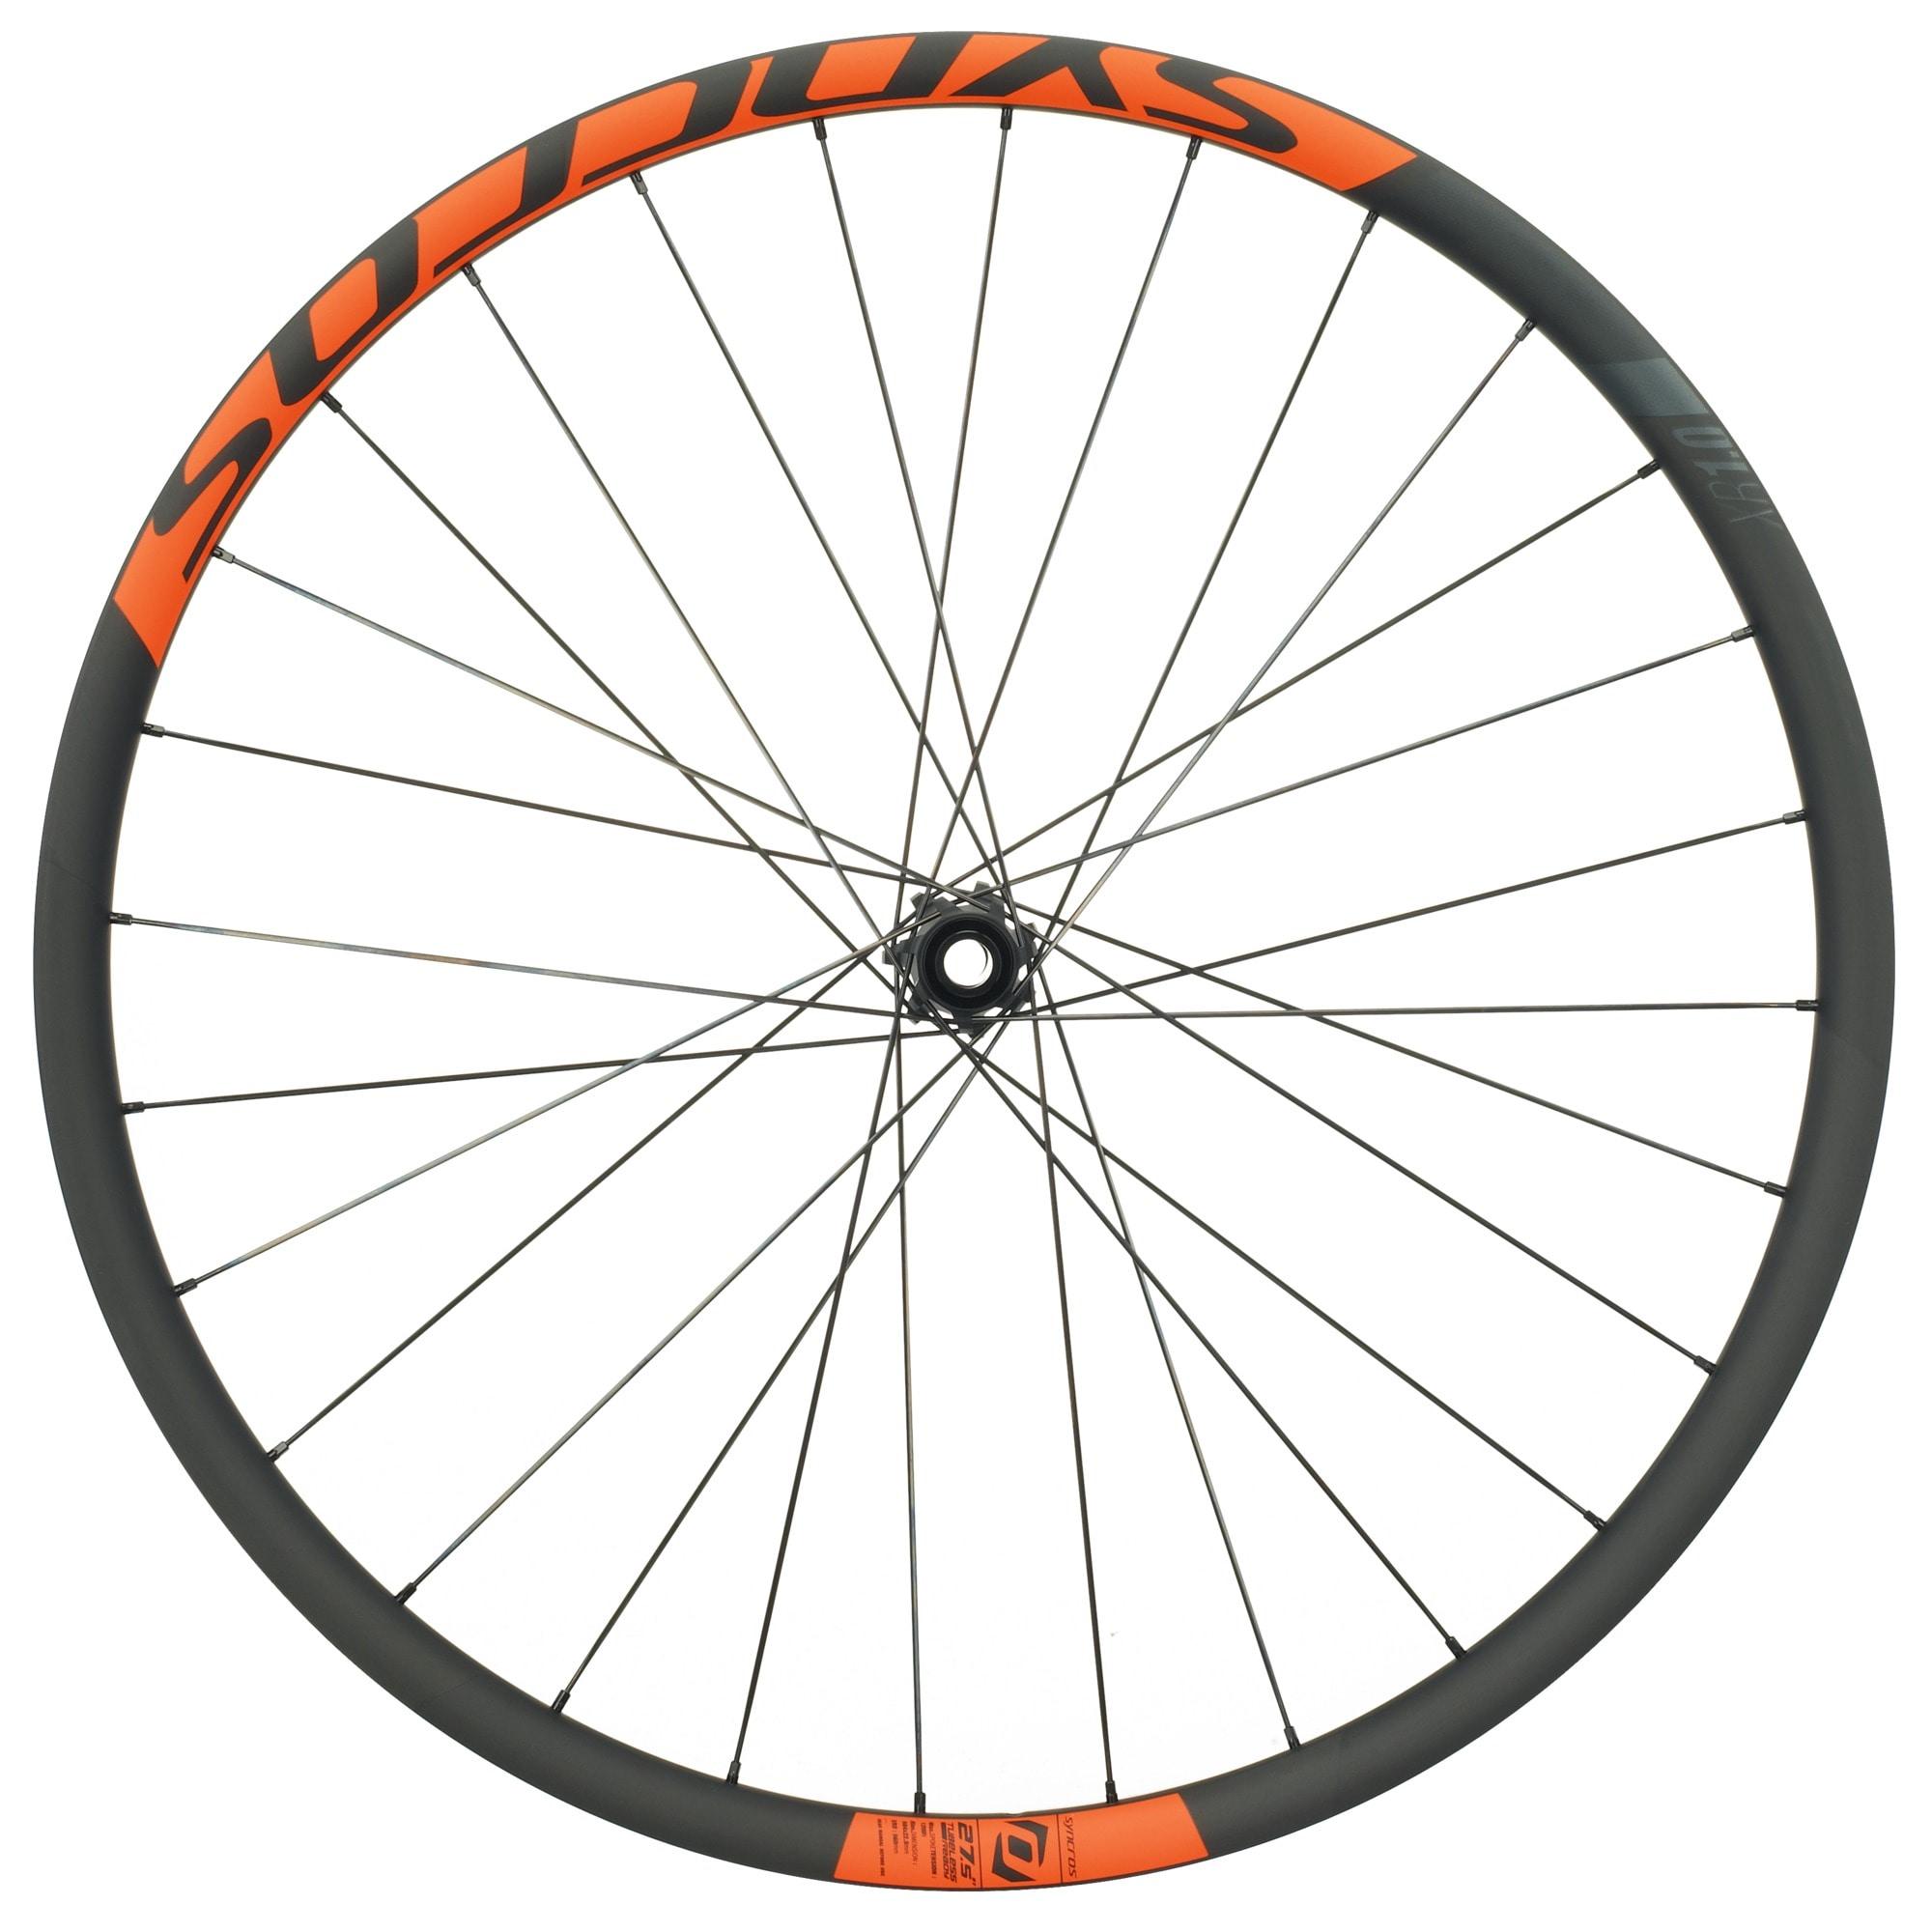 "Syncros Hjul, XR1.0 CB Boost 110/148 mm 29"", Svart/Orange"